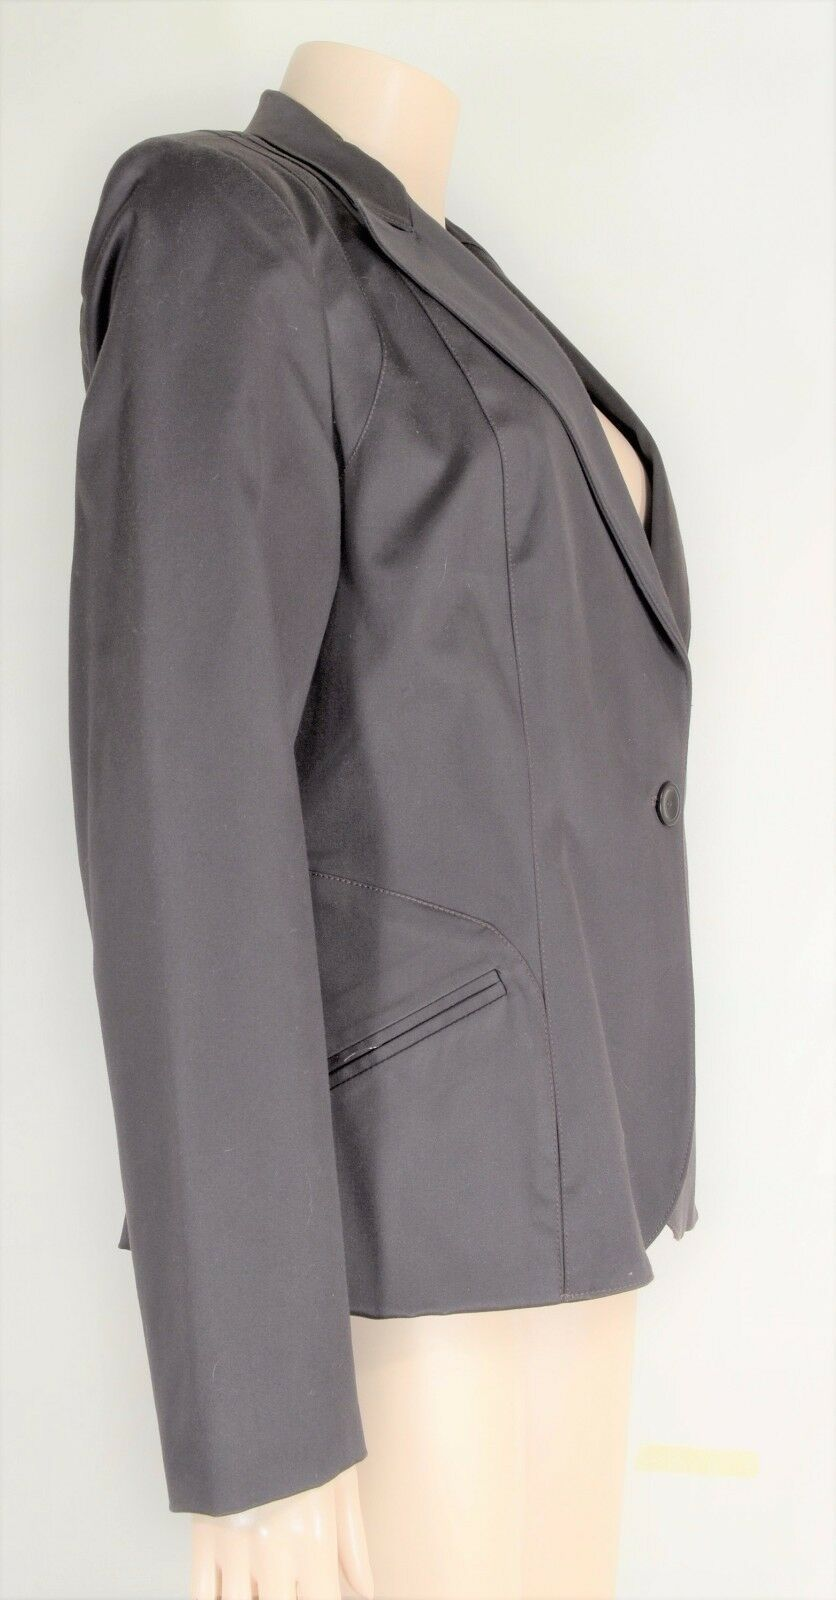 womyn jacket coat NWT SZ 8 dark brown 1-button closure lined NYC USA new image 6